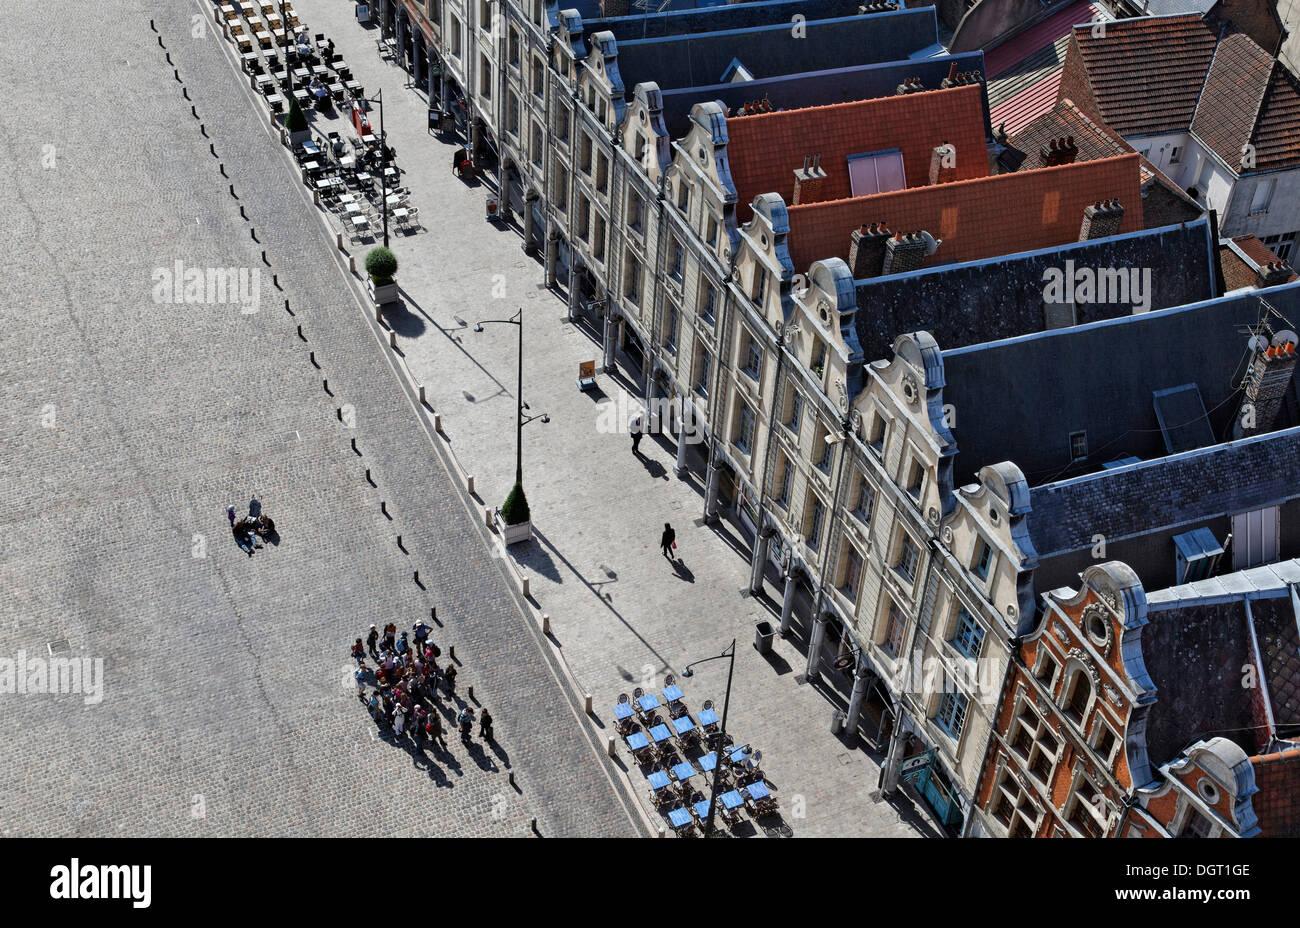 Place des Héros square in Arras, view from the tower of the Town Hall, Via Francigena, Pas-de-Calais department - Stock Image